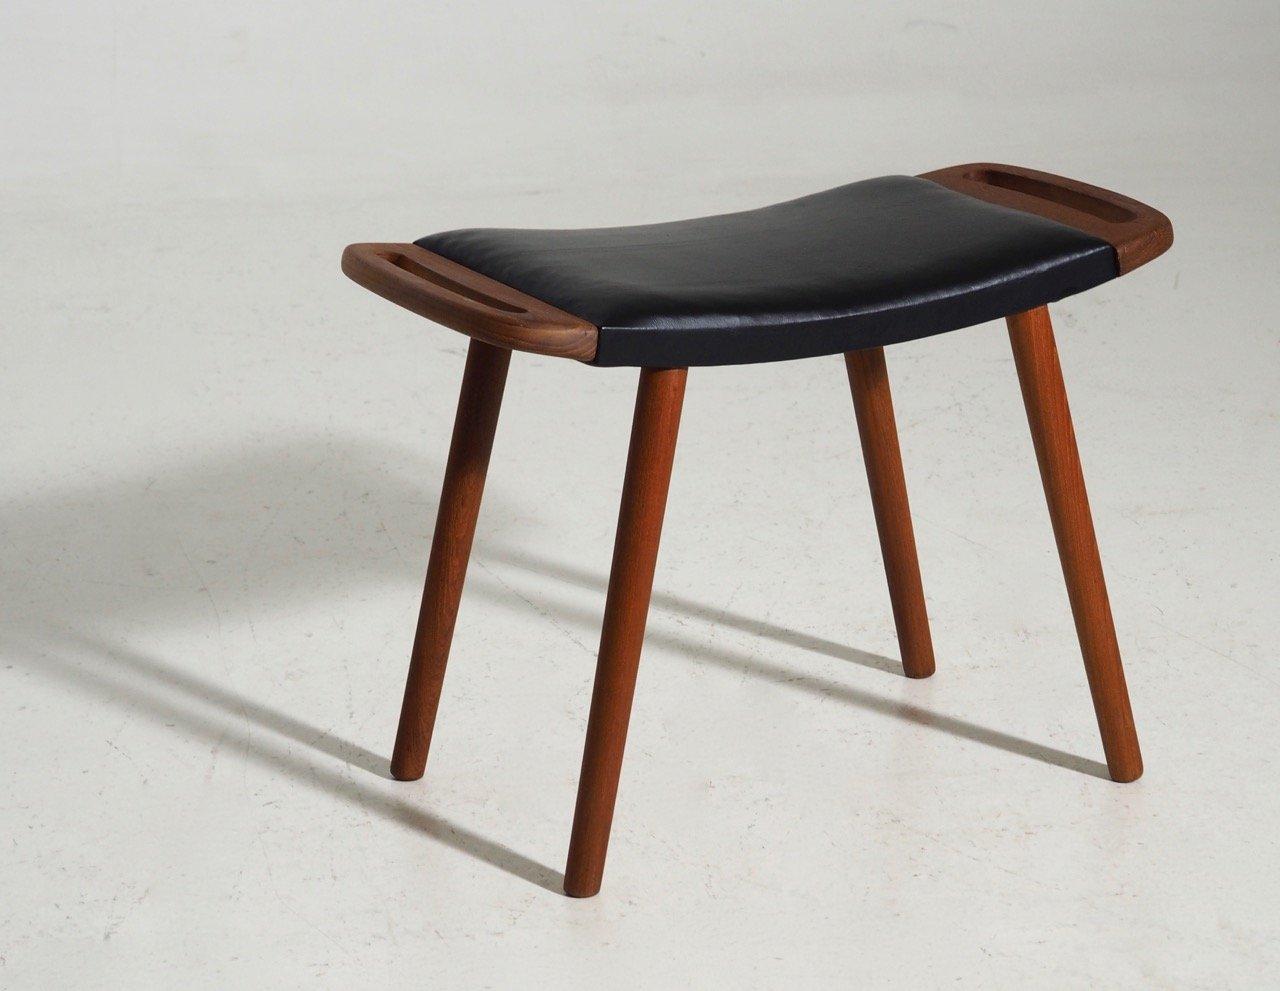 Danish Teak Stool, 1960s for sale at Pamono